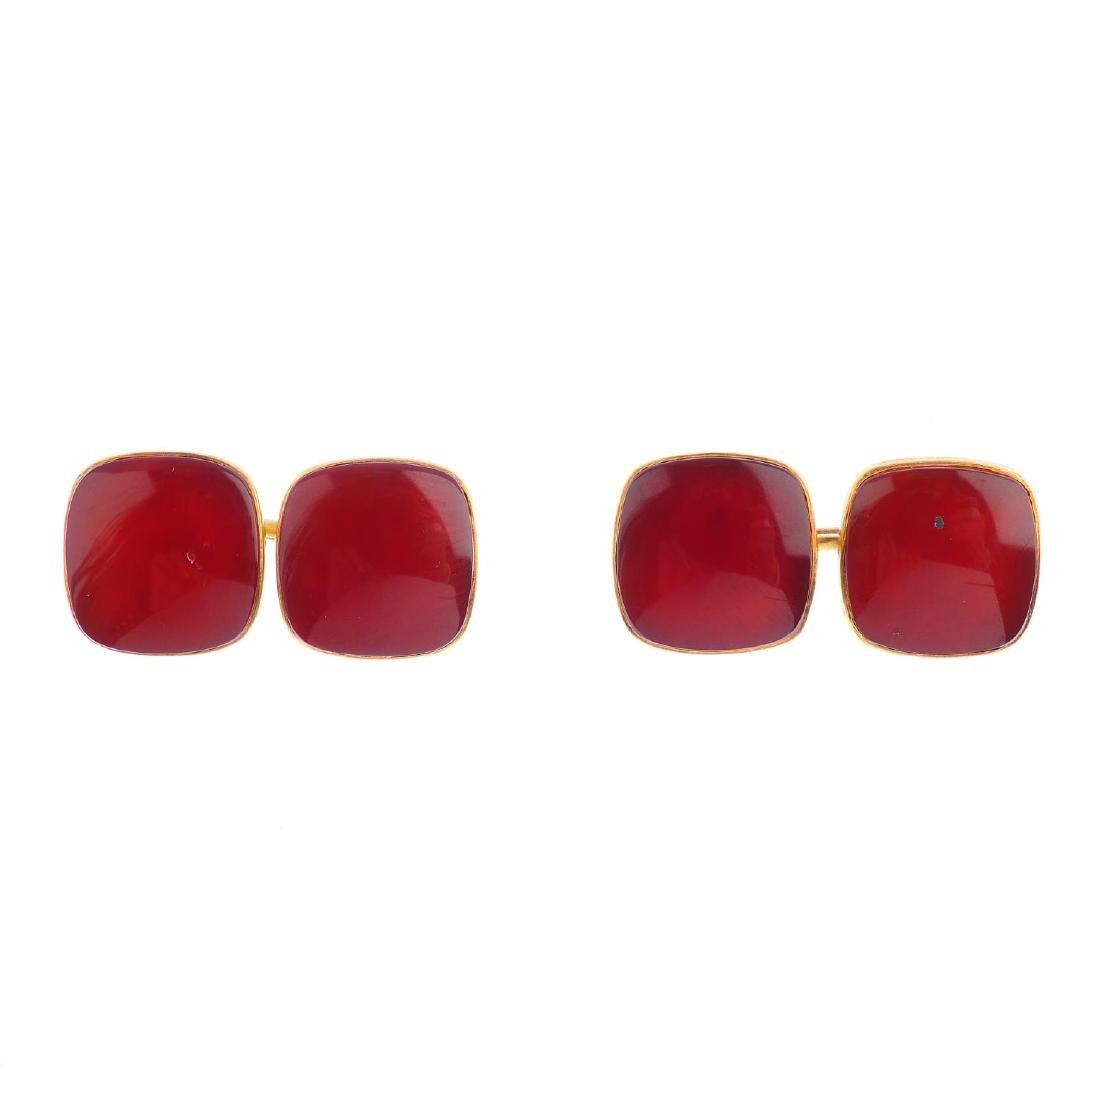 A pair of carnelian cufflinks. Each designed as two